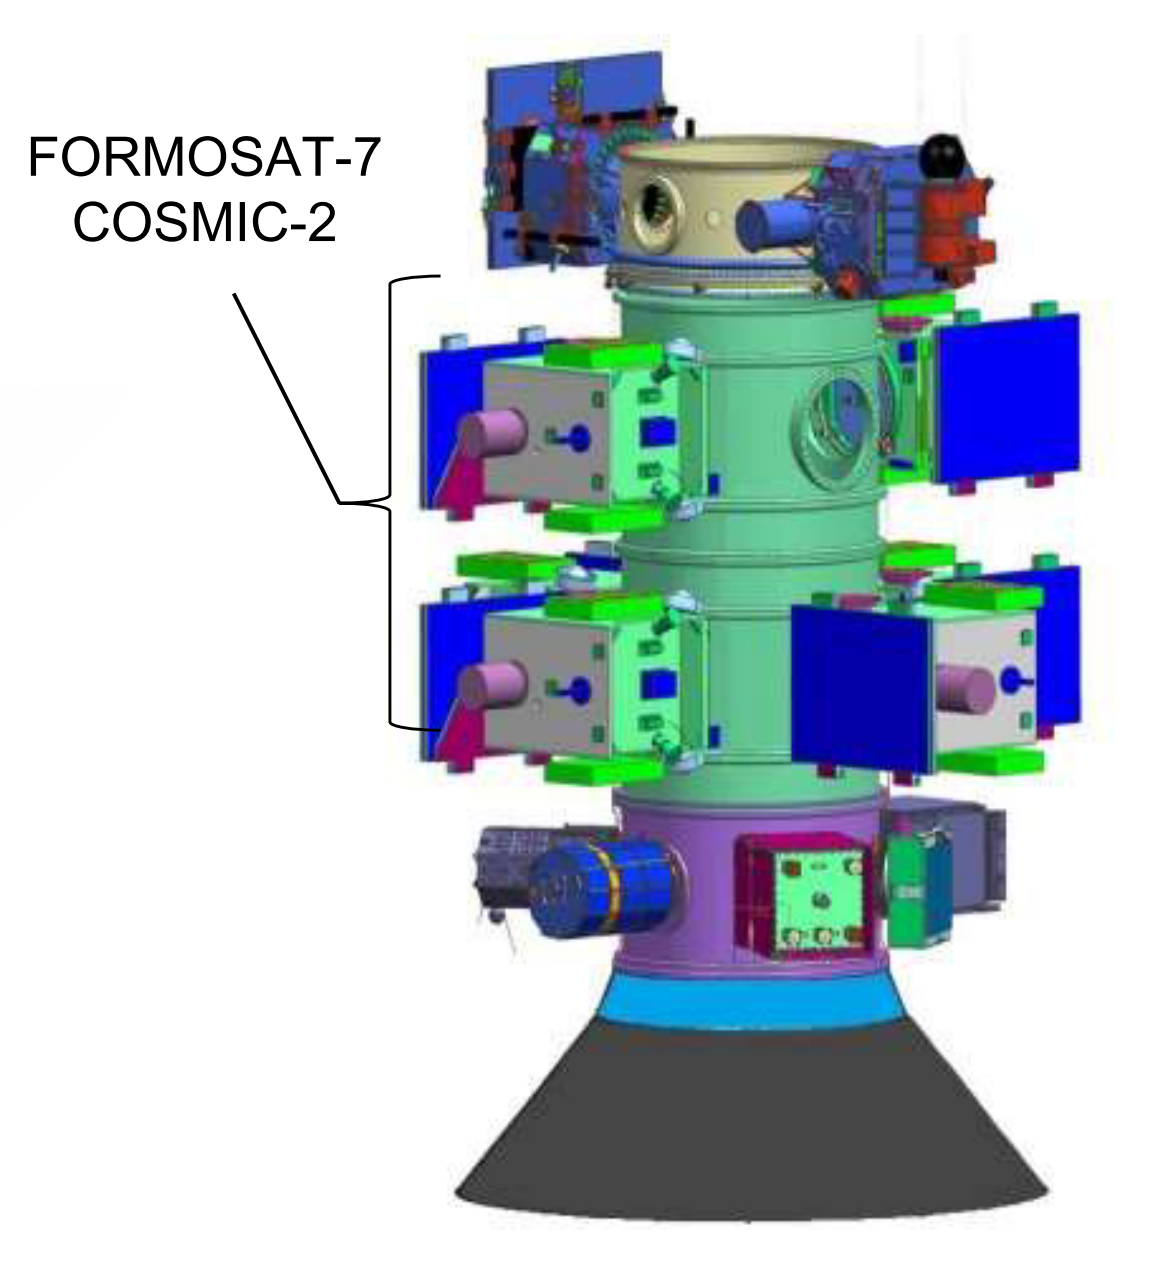 COSMIC-2 Formosat-7 stack